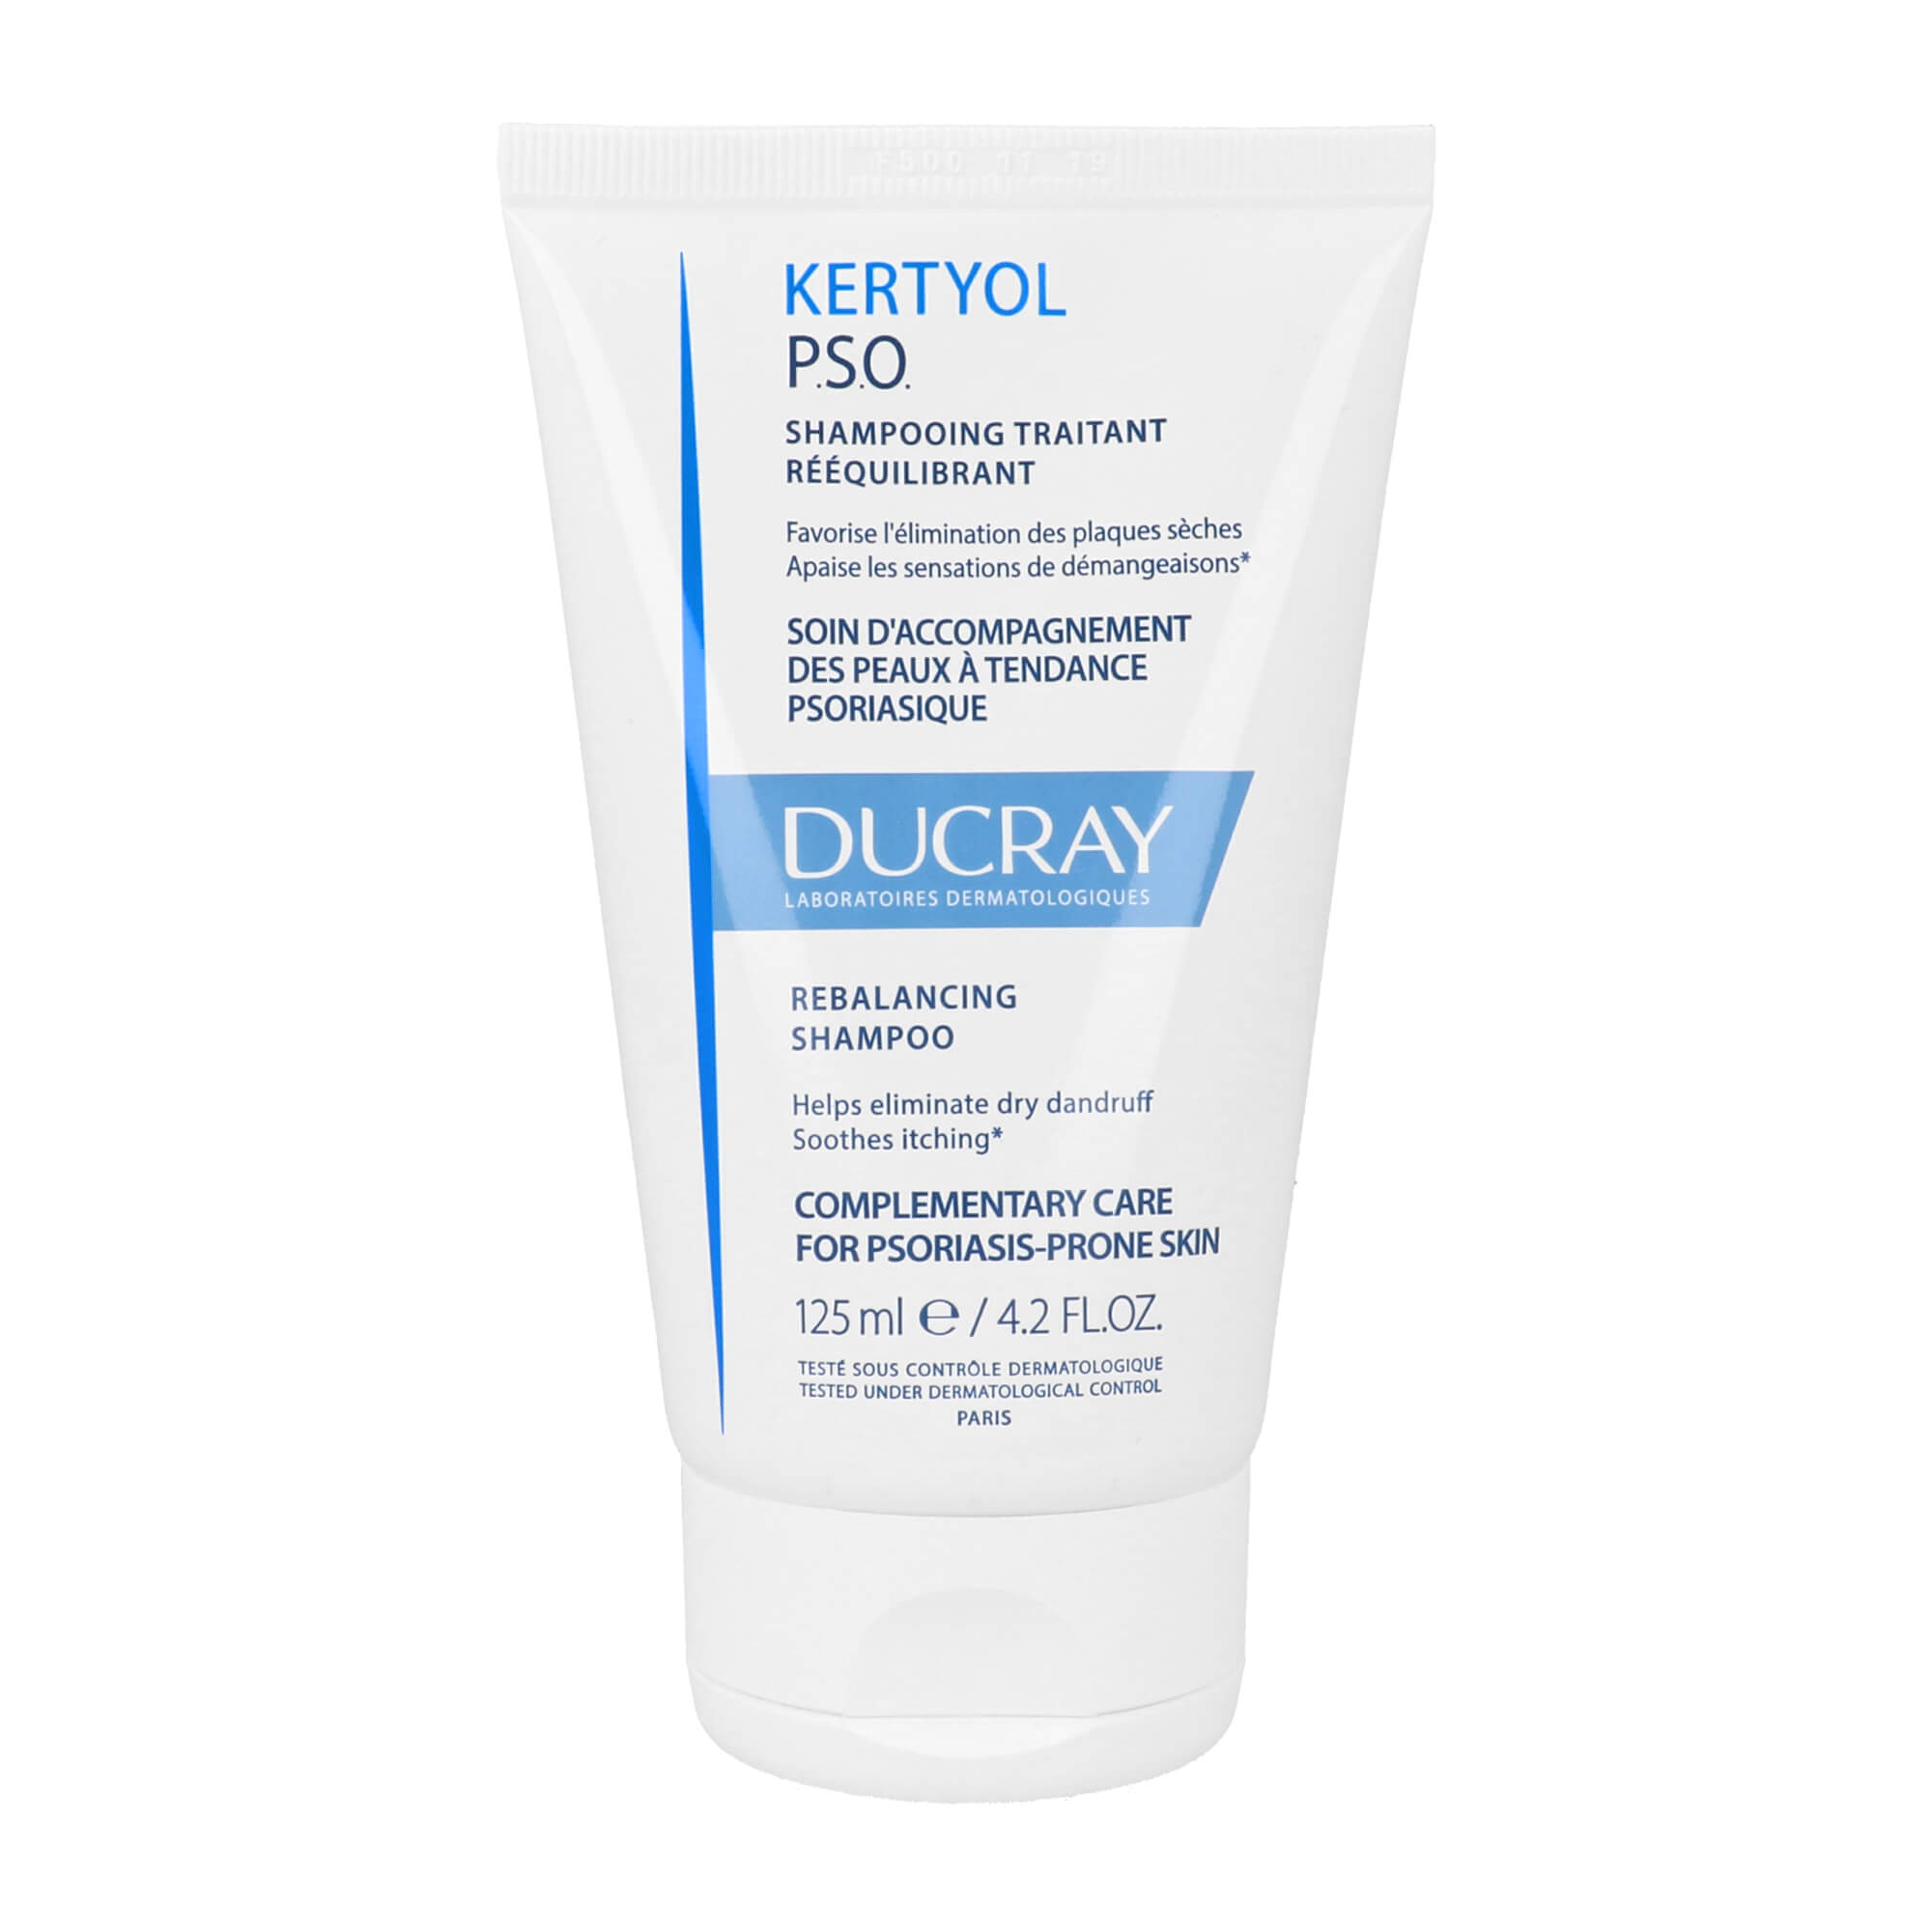 Ducray Kertyol P.S.O Kur-Shampoo